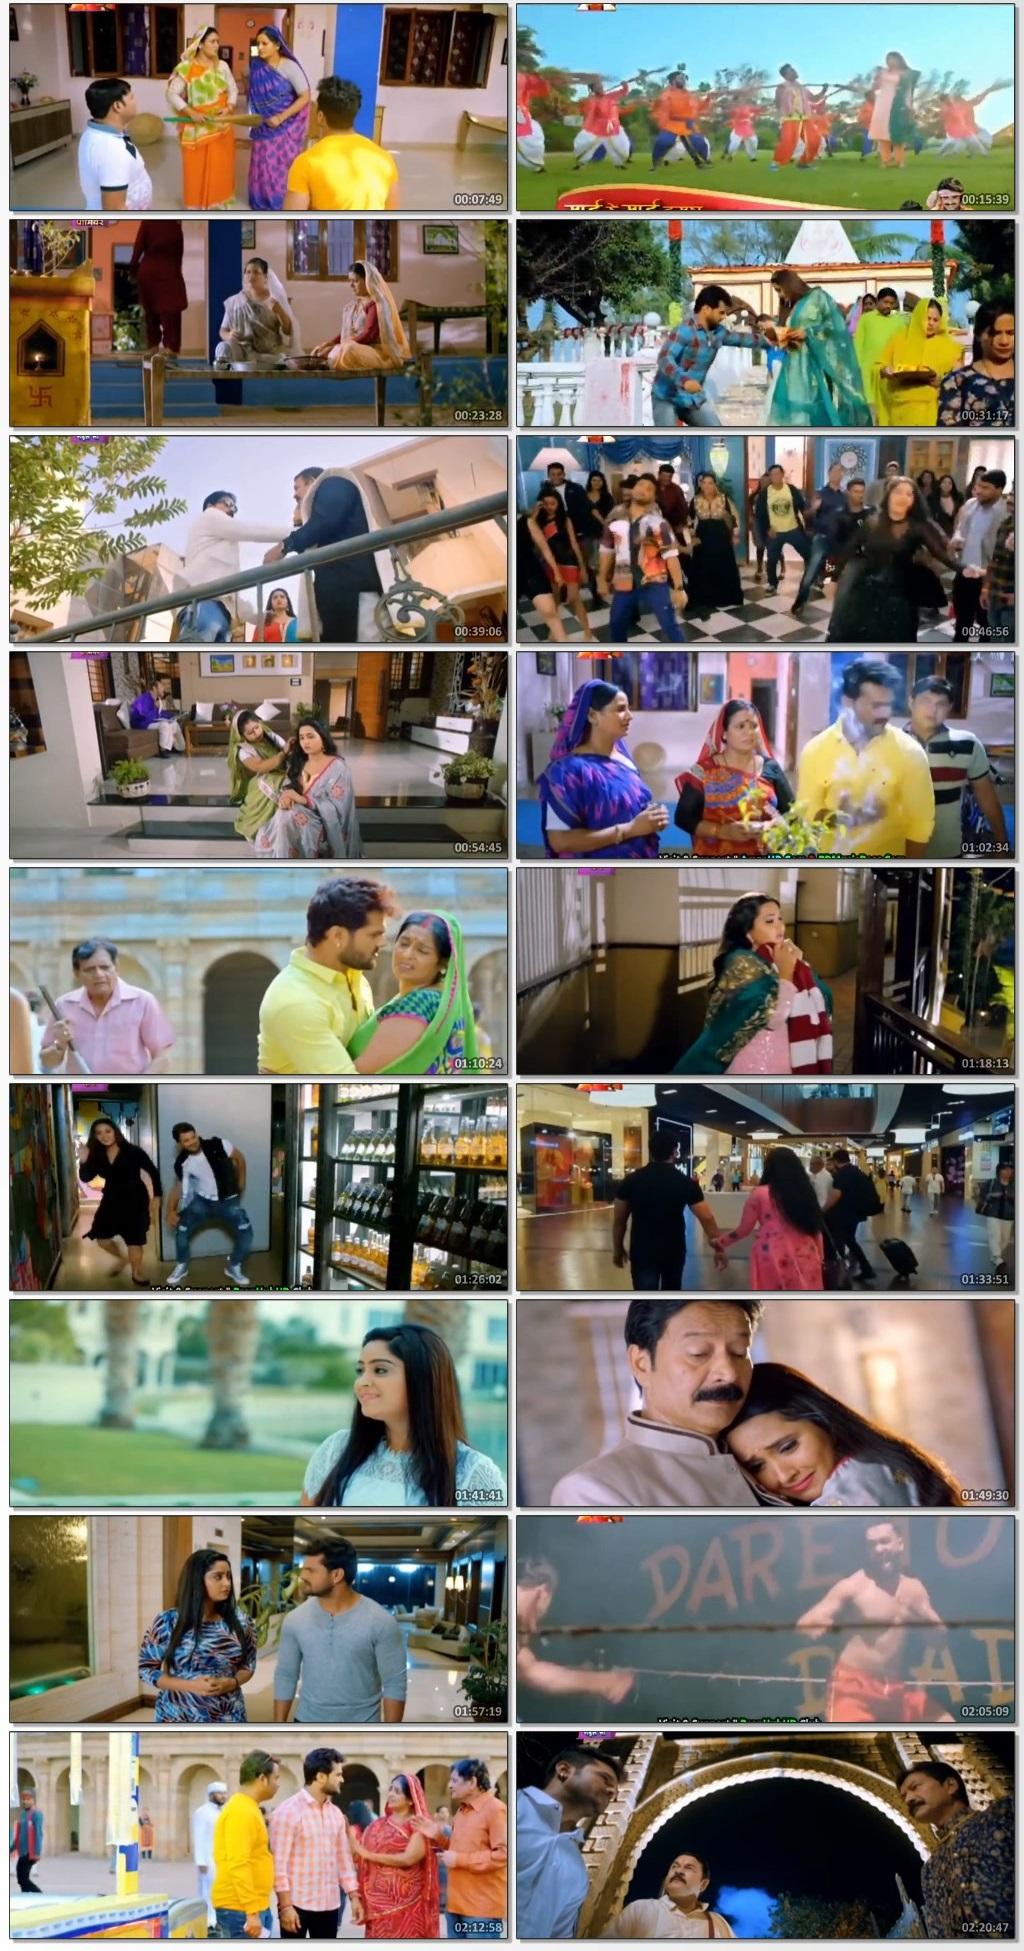 www-7-Star-HD-Cards-Saiyan-Arab-Gaile-Na-2021-Bhojpuri-720p-Encoded-mkv-thumbs